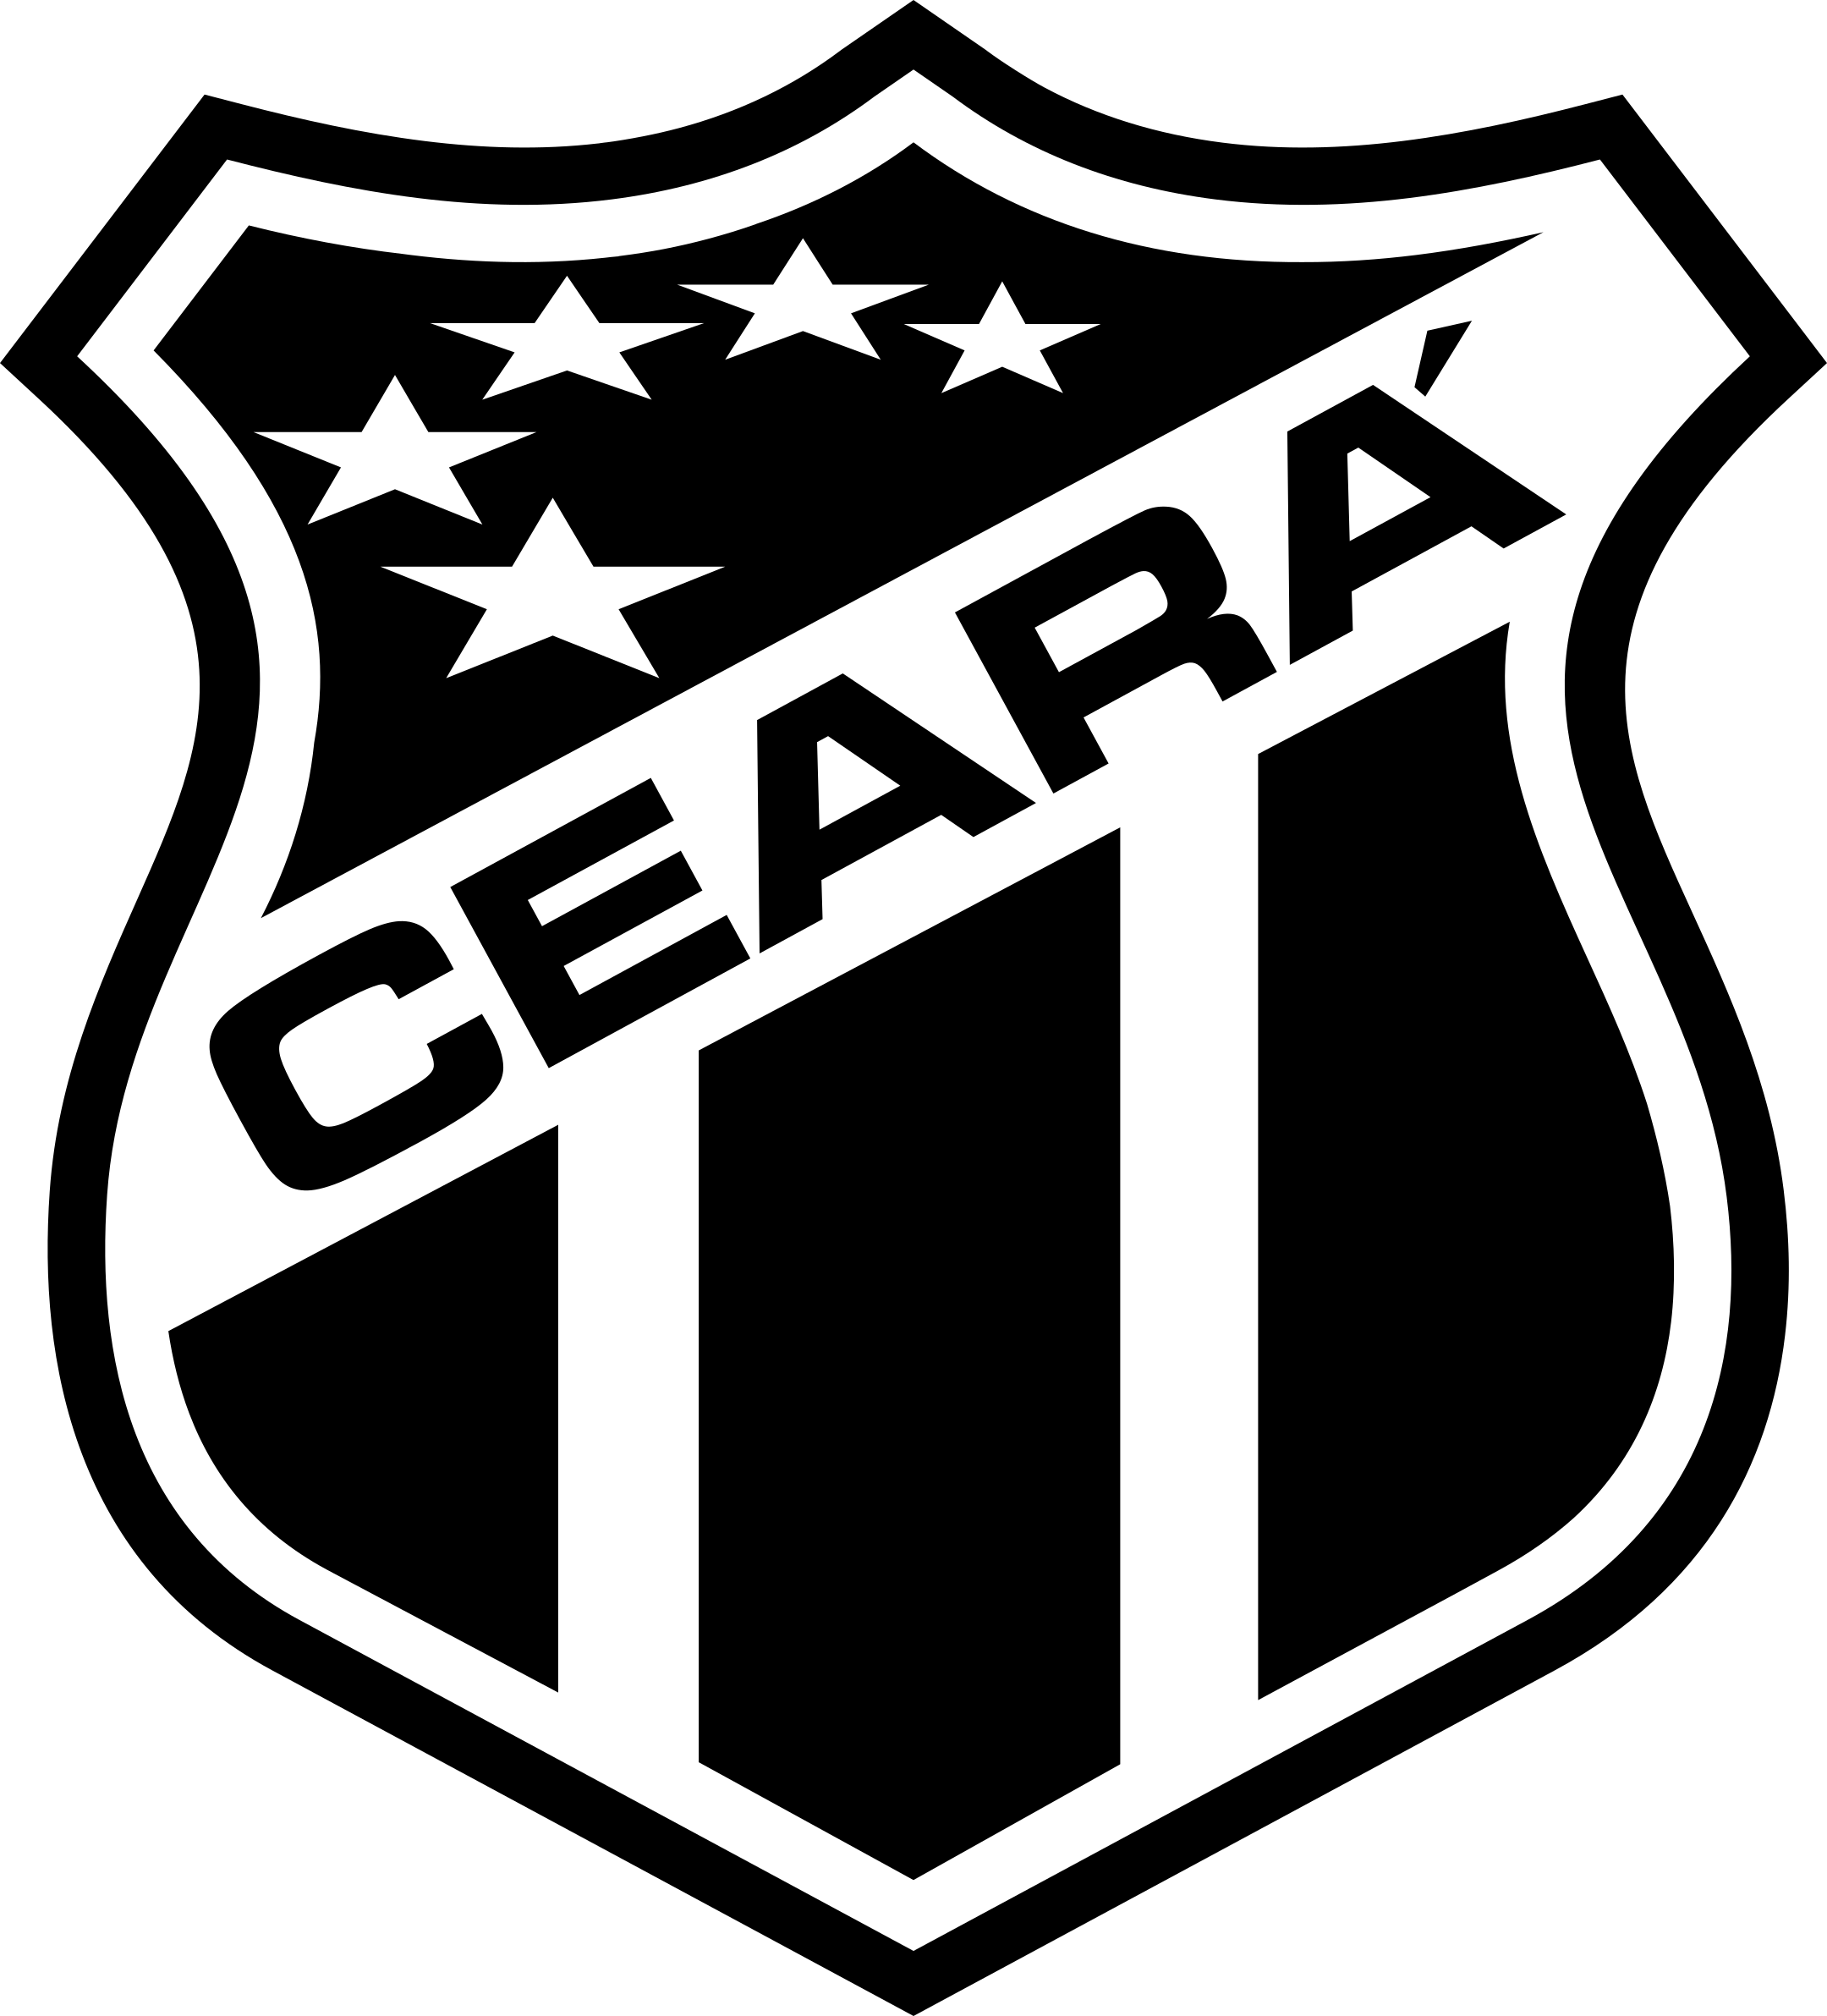 ceara logo 1 - Ceará SC Logo